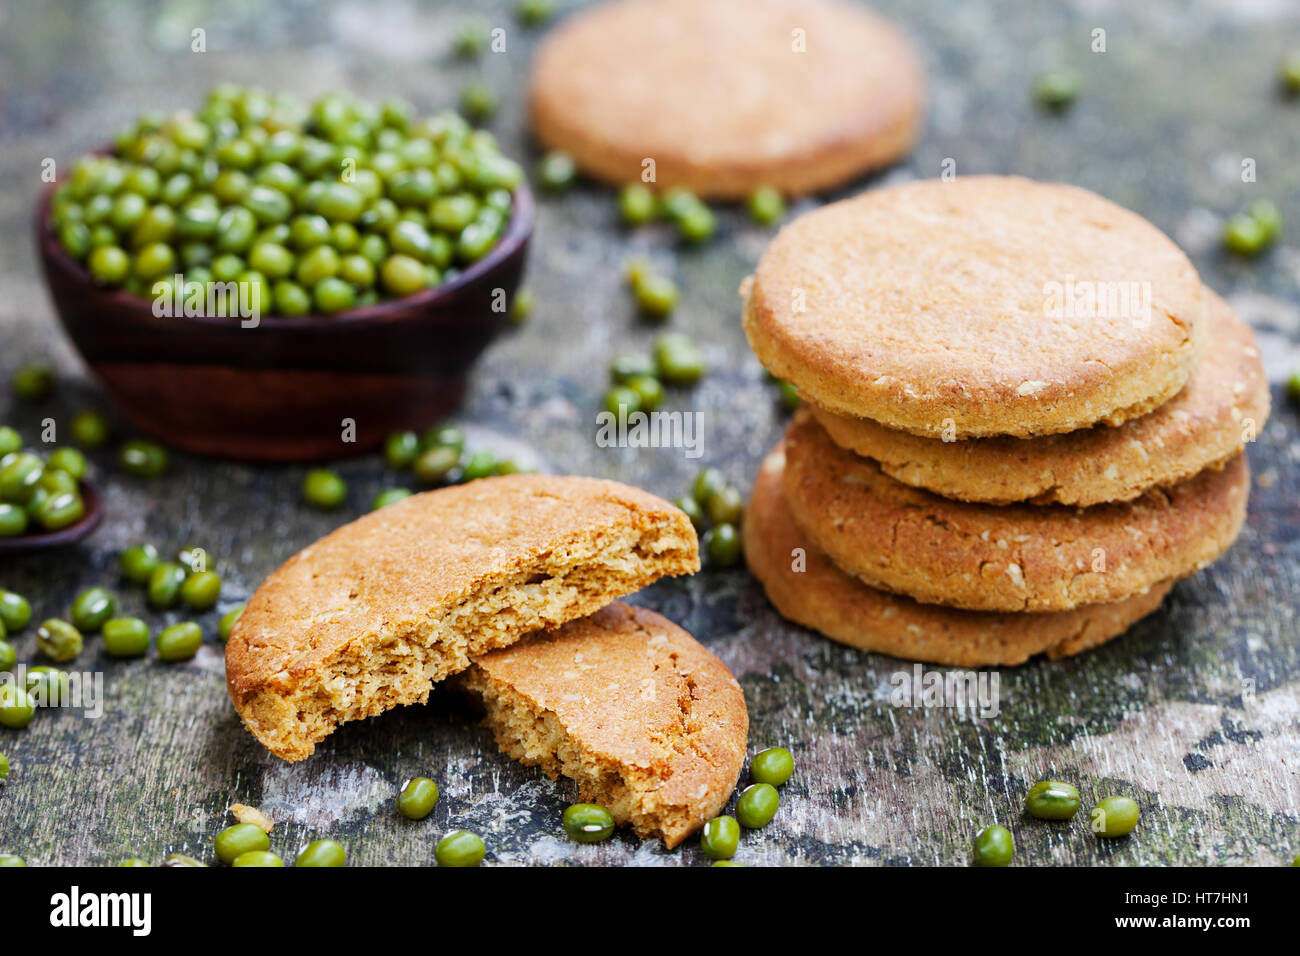 Mung bean cookies, healthy vegan dessert. Stock Photo